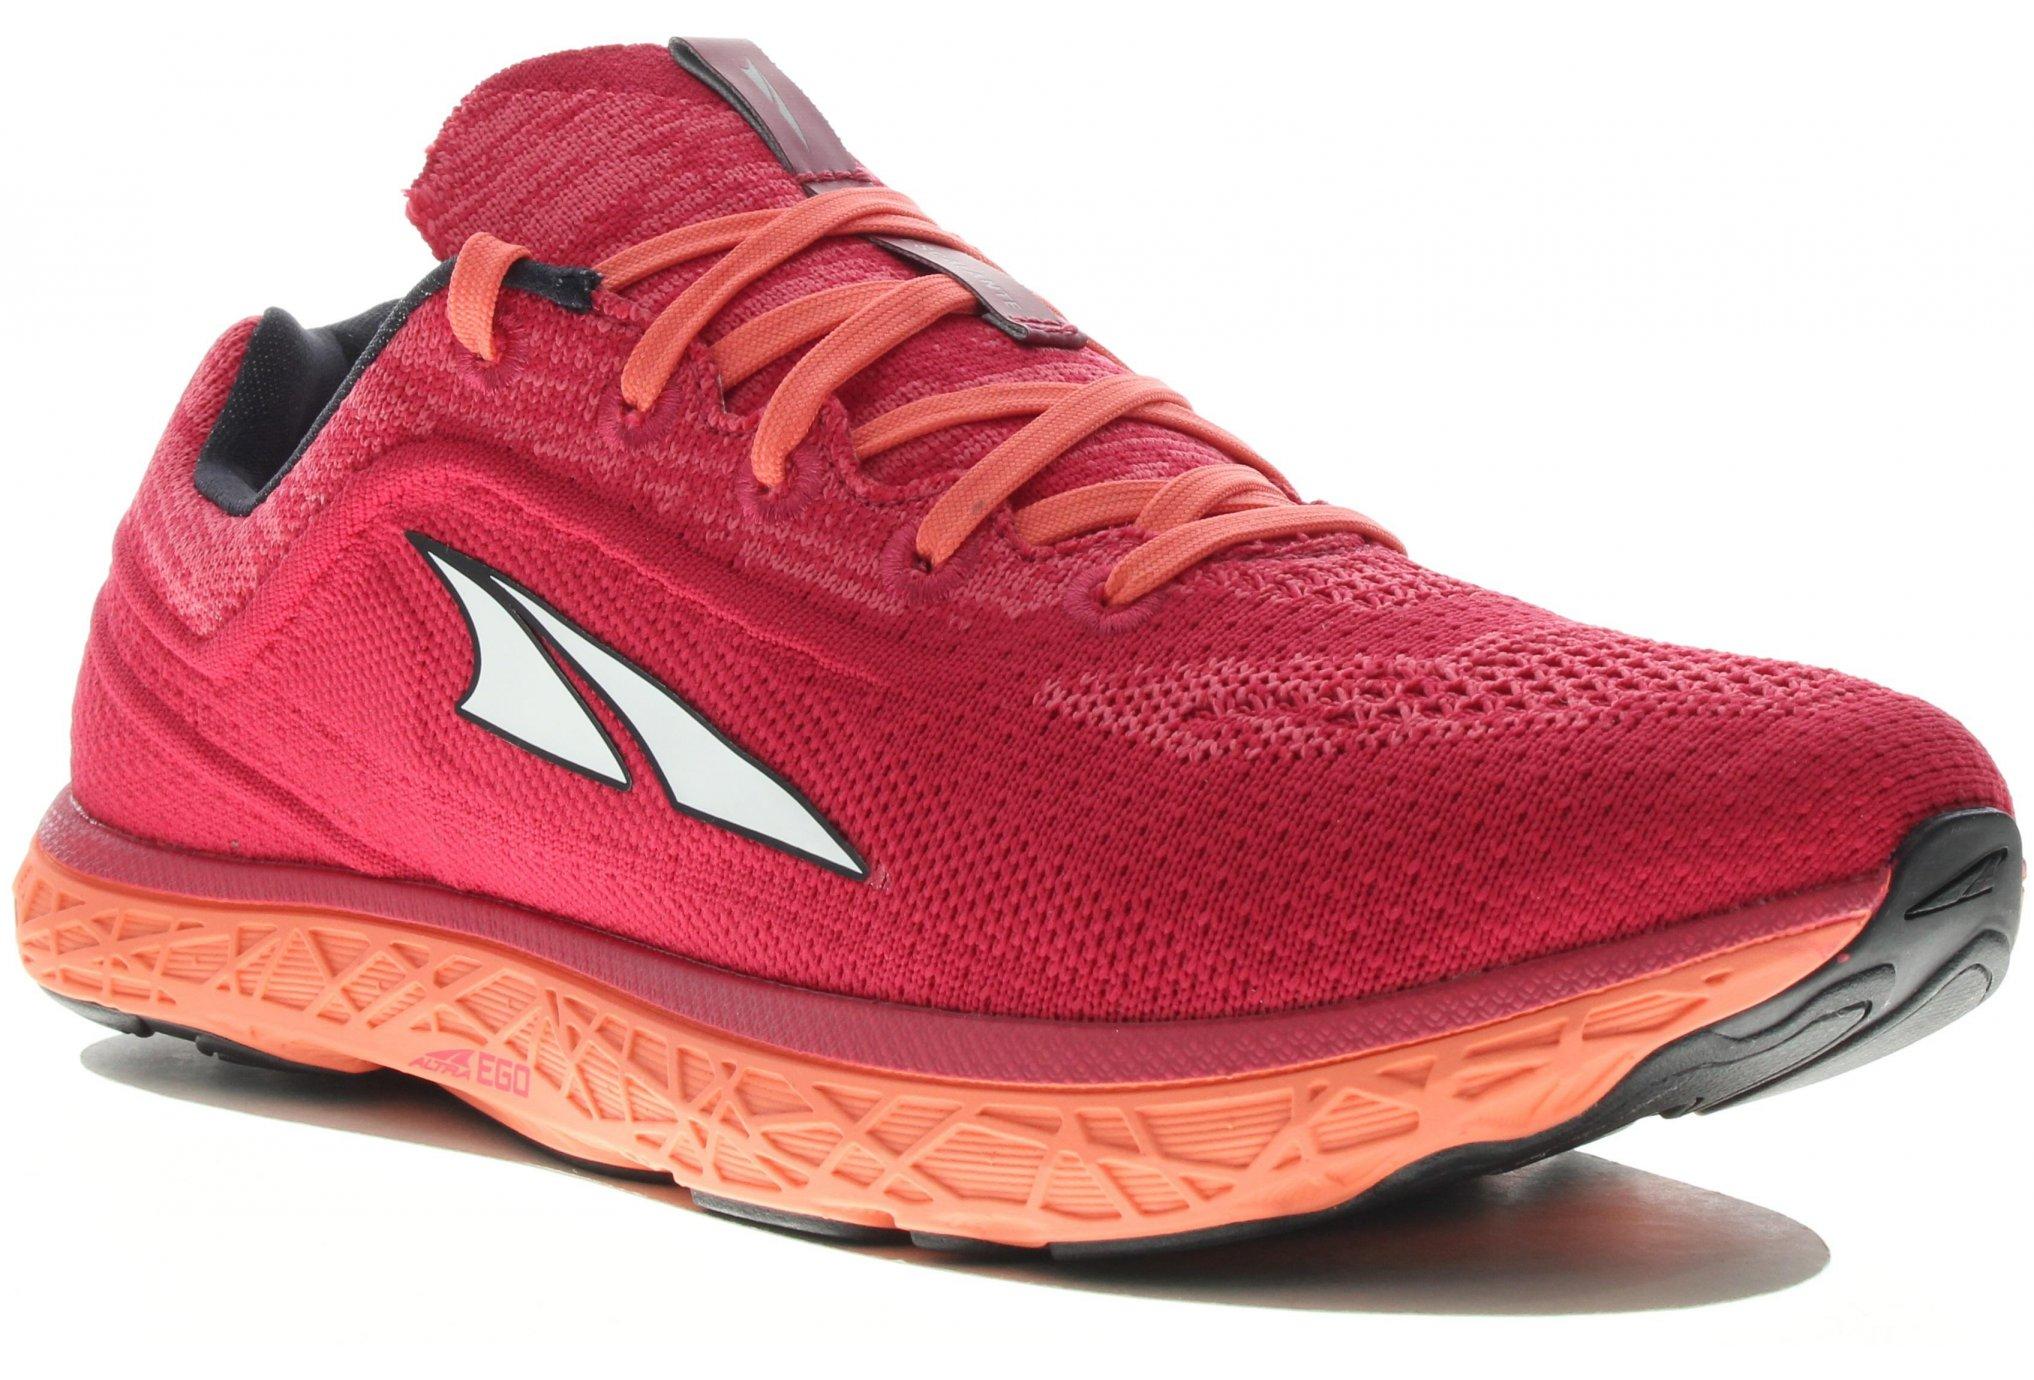 Altra Escalante 2.5 W Chaussures running femme